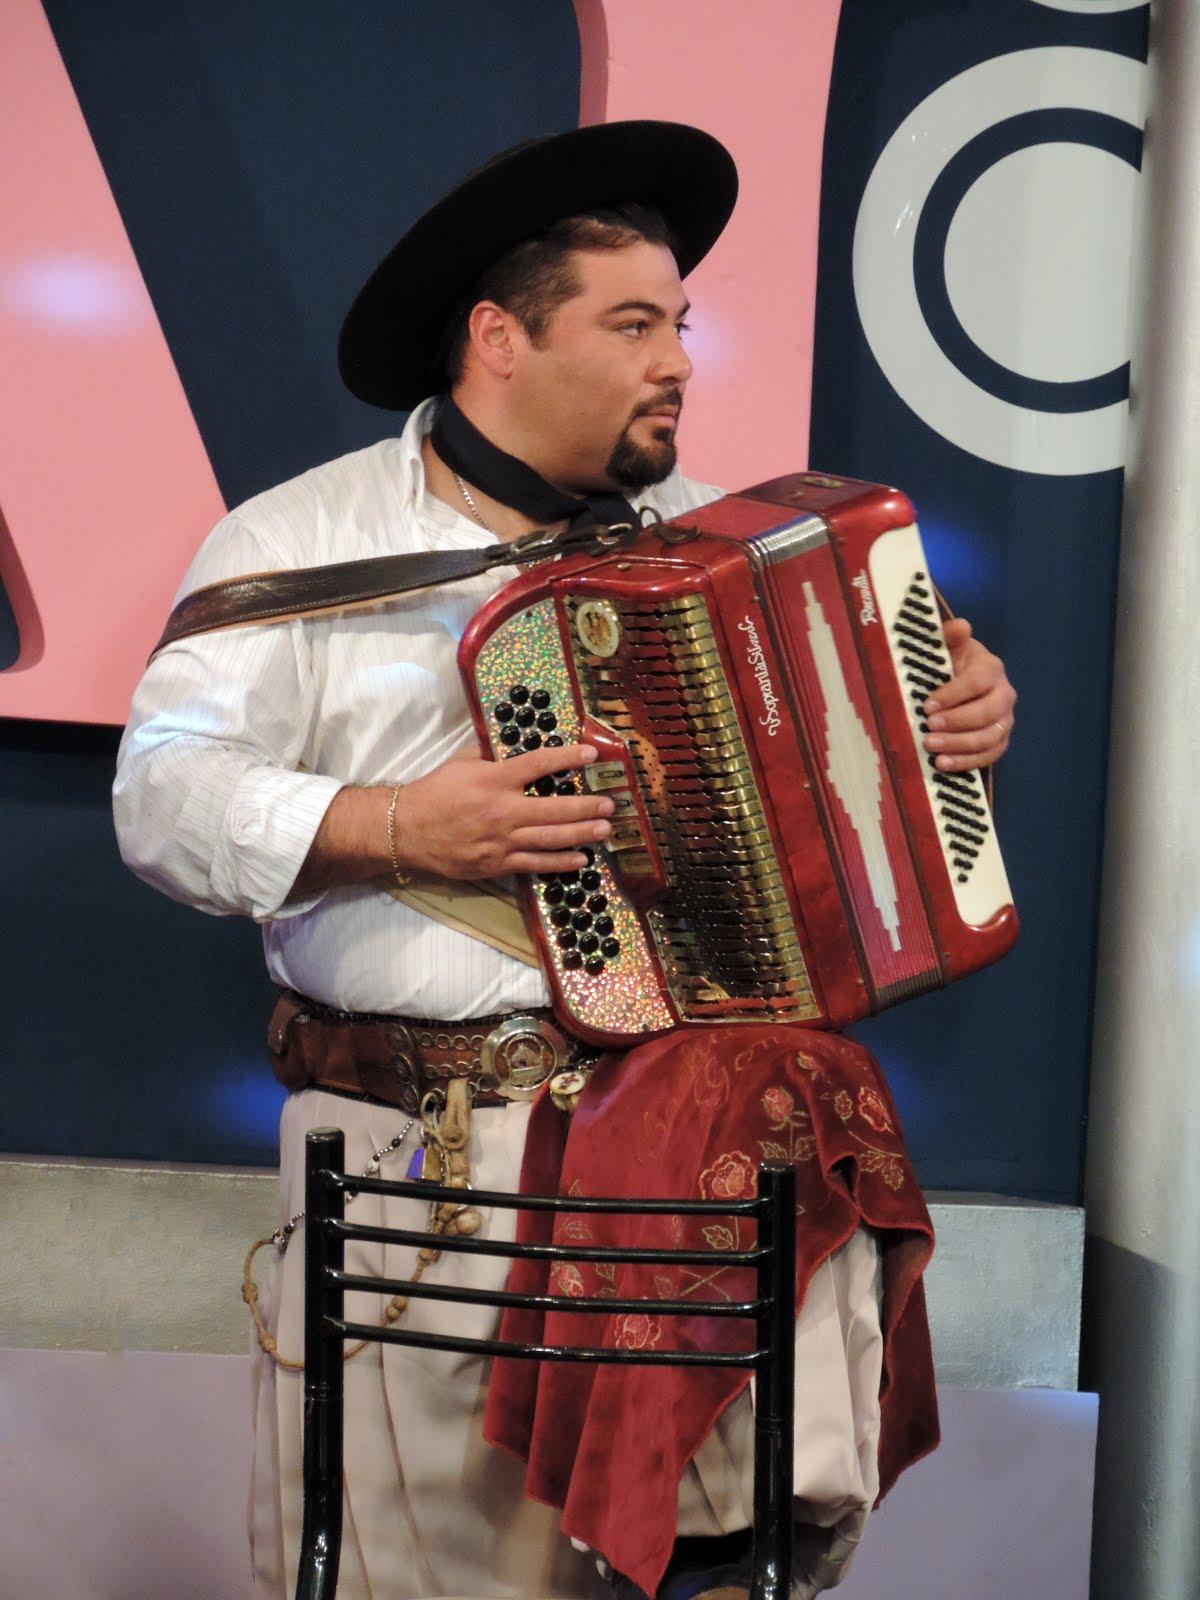 CACHITO GONZALEZ